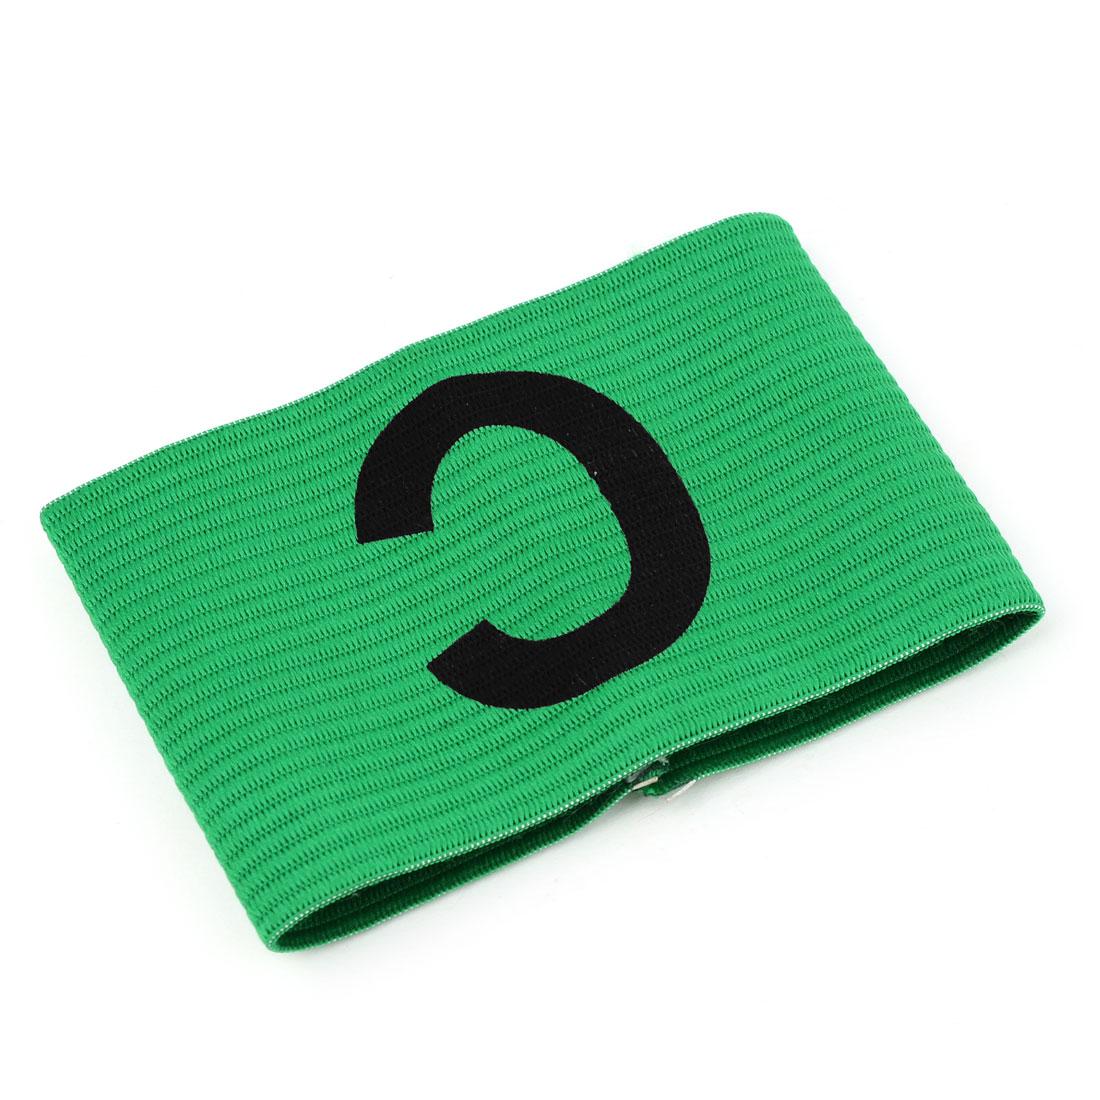 Portable Green Elastic Tension Football Soccer Captain Armband